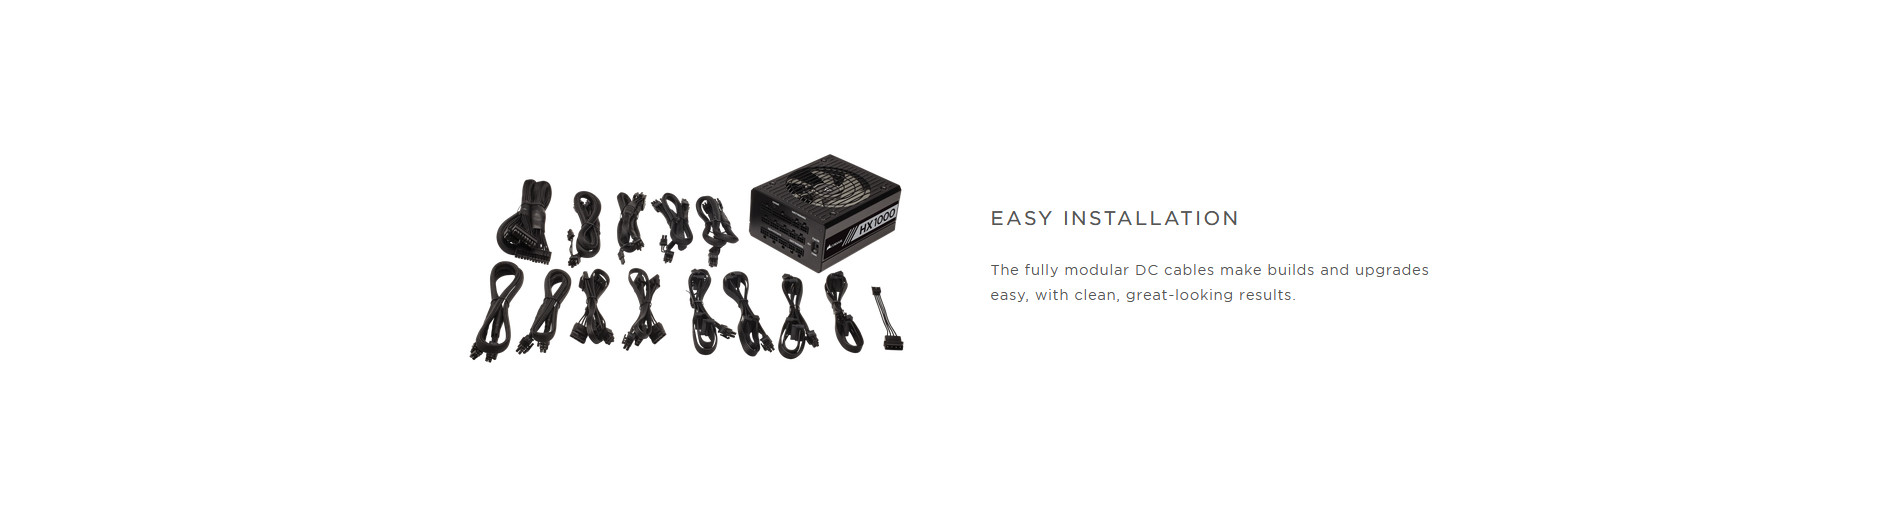 Nguồn Corsair HX1000 1000W (80 Platinum/Màu Đen/Full Modul) giới thiệu 5